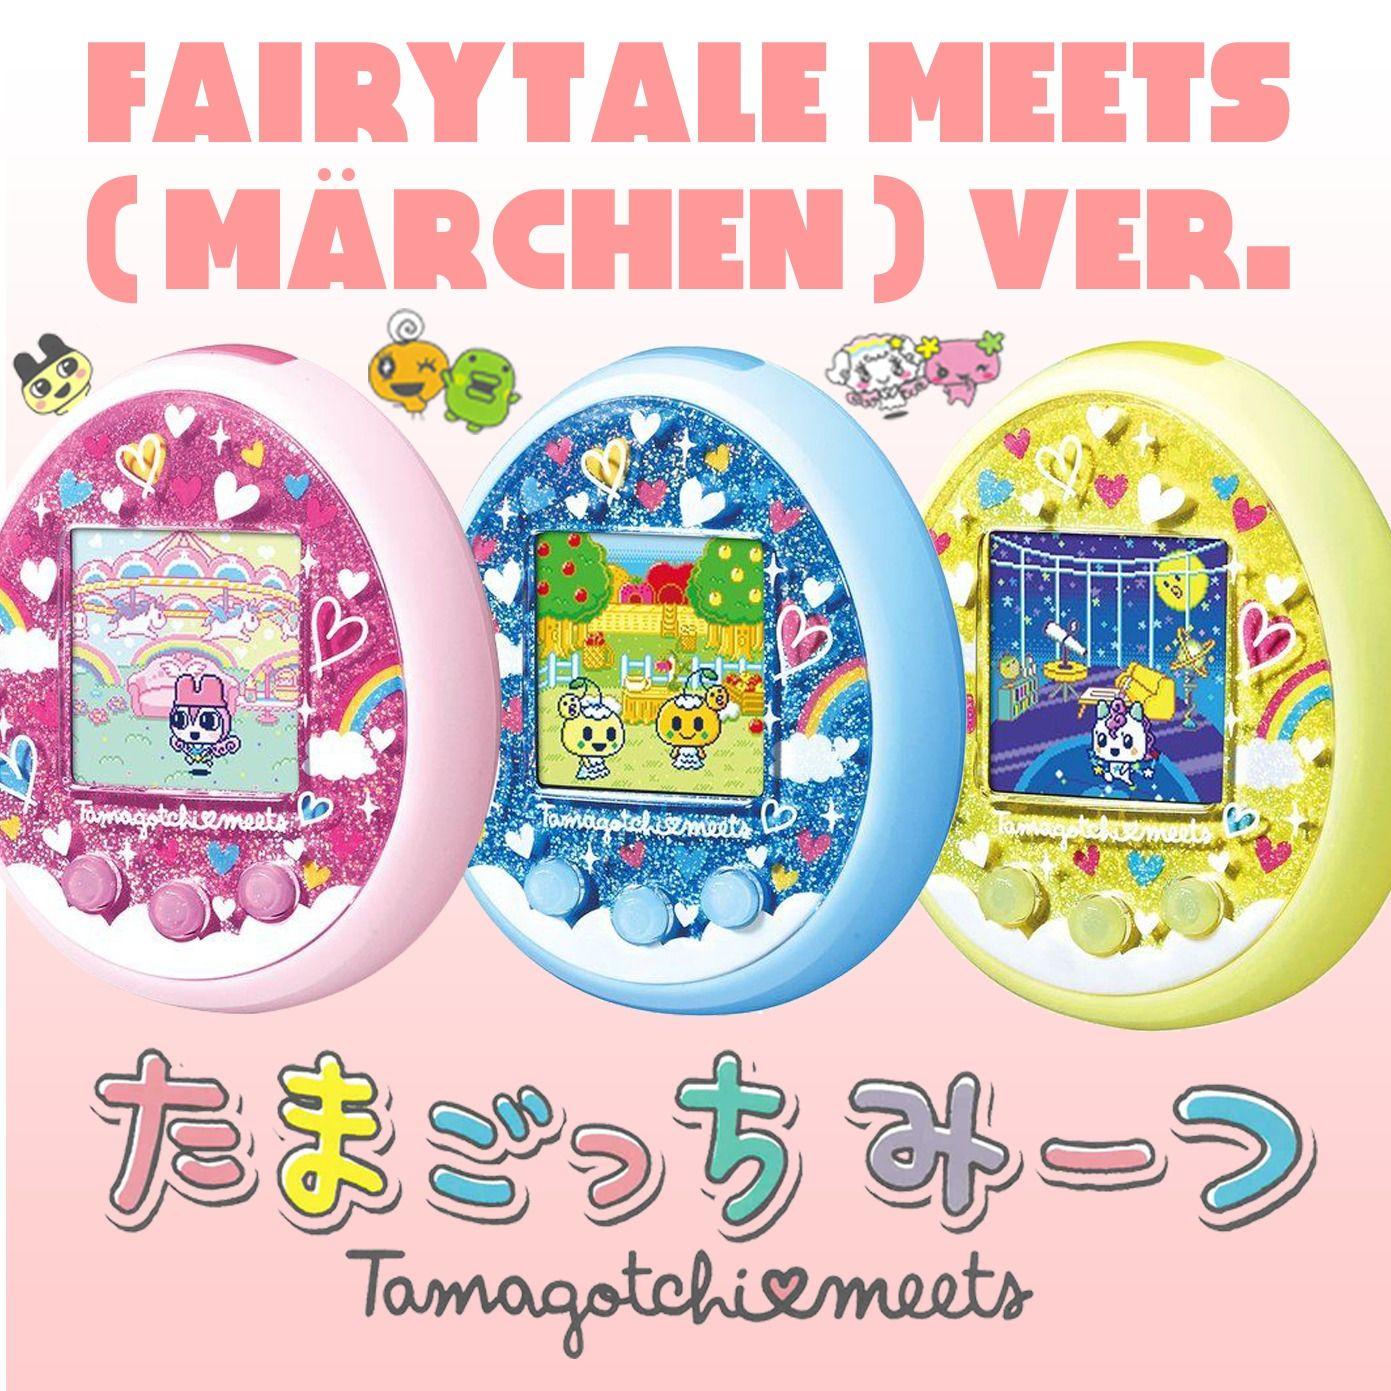 New Tamagotchi Meets Fairytale Marchen Meets Ver Bandai 23 Nov 2018 Japanese App Fairy Tales Virtual Pet